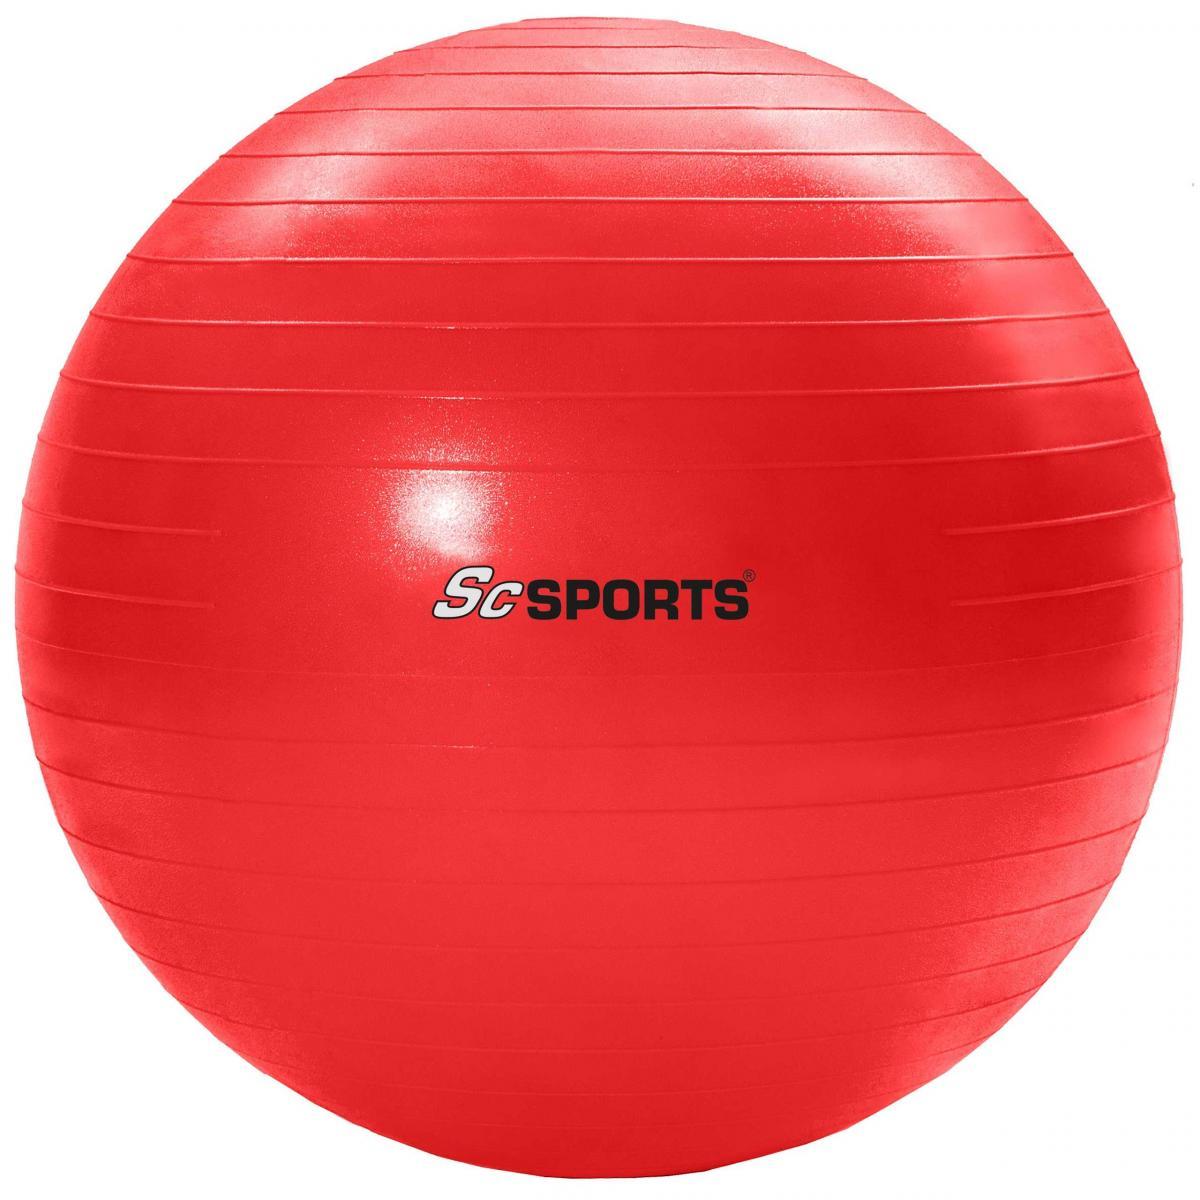 ScSPORTS Gymnastikball rot 65 cm SC-100396-350